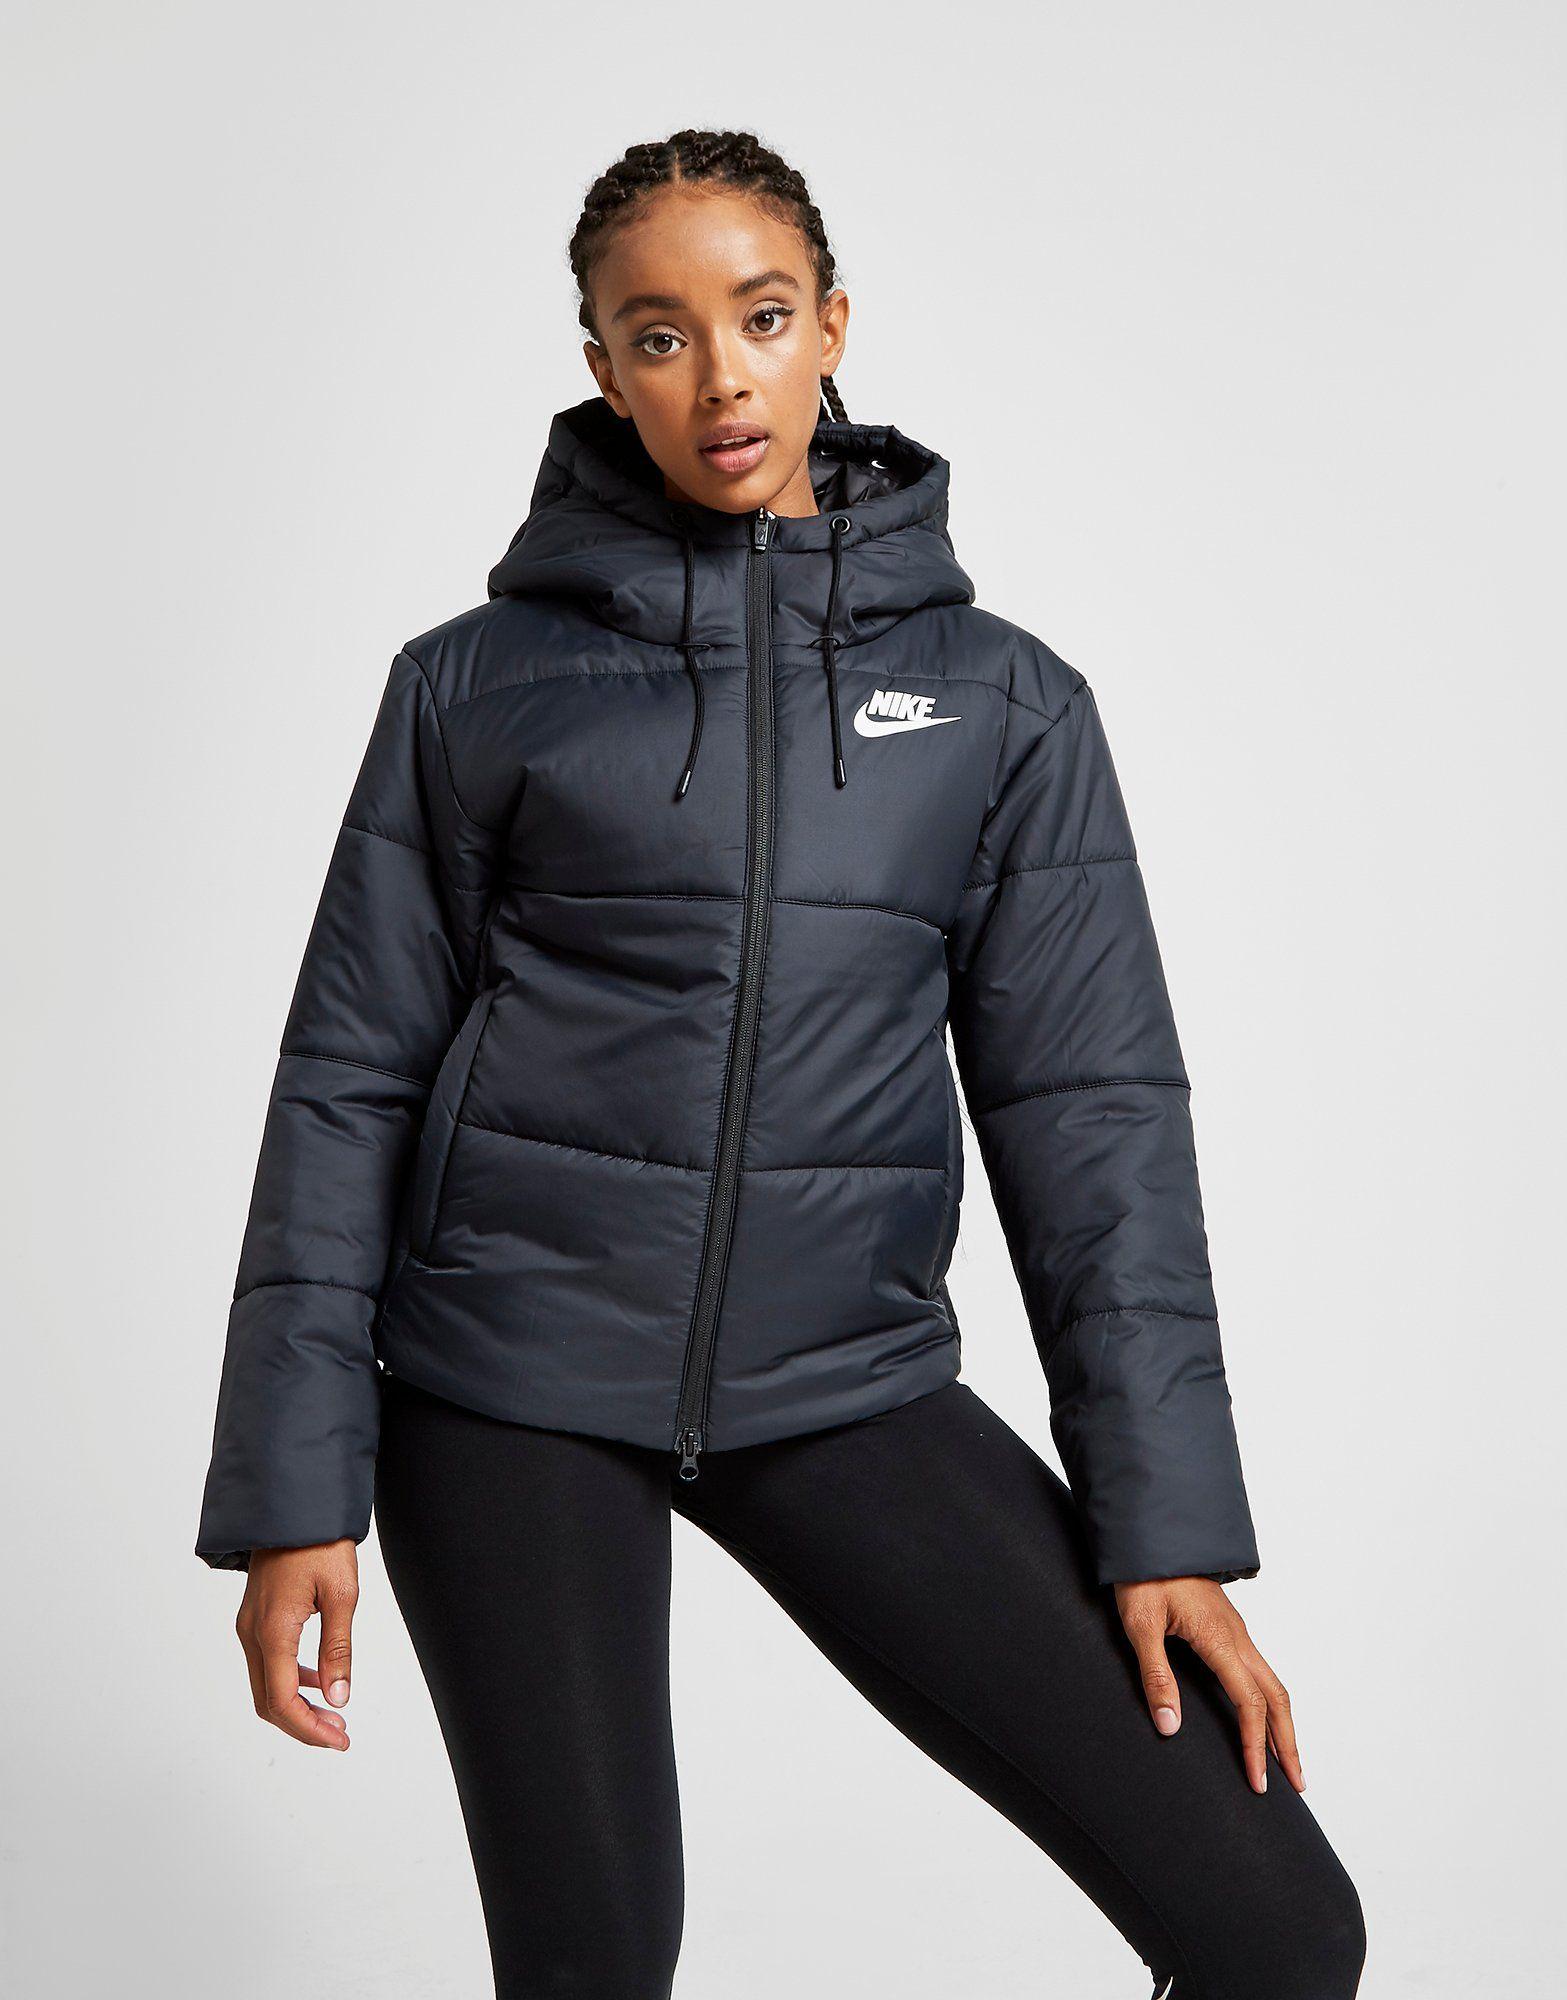 2019 Jd JacketMode Padded SportsWhite Nike In Swoosh j5Rq34LA